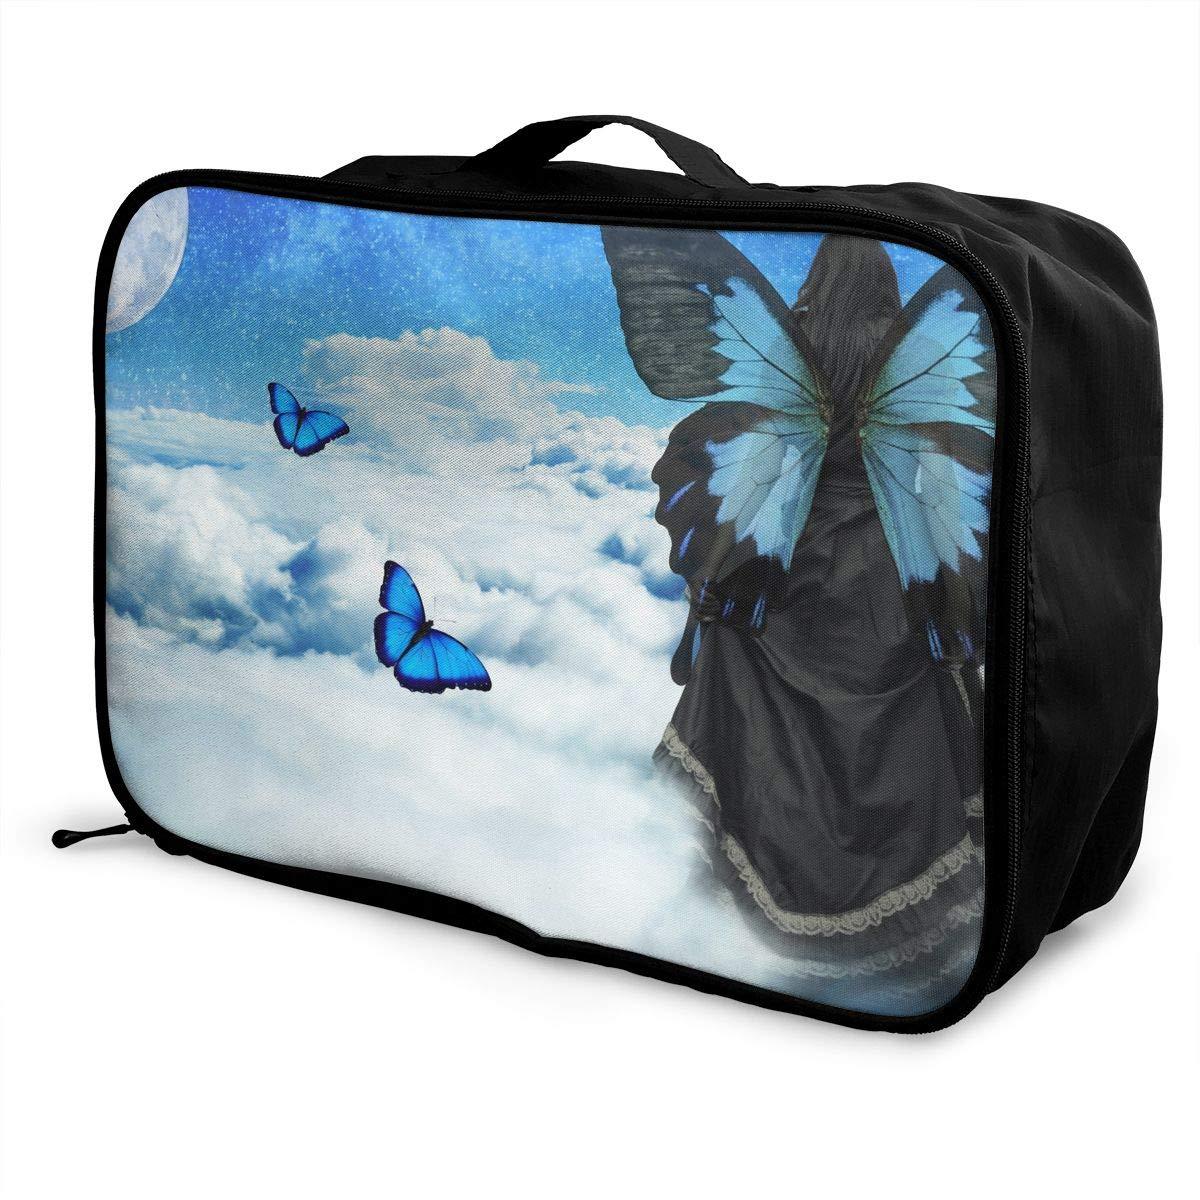 Travel Luggage Duffle Bag Lightweight Portable Handbag Fantasy Sky Butterfly Large Capacity Waterproof Foldable Storage Tote